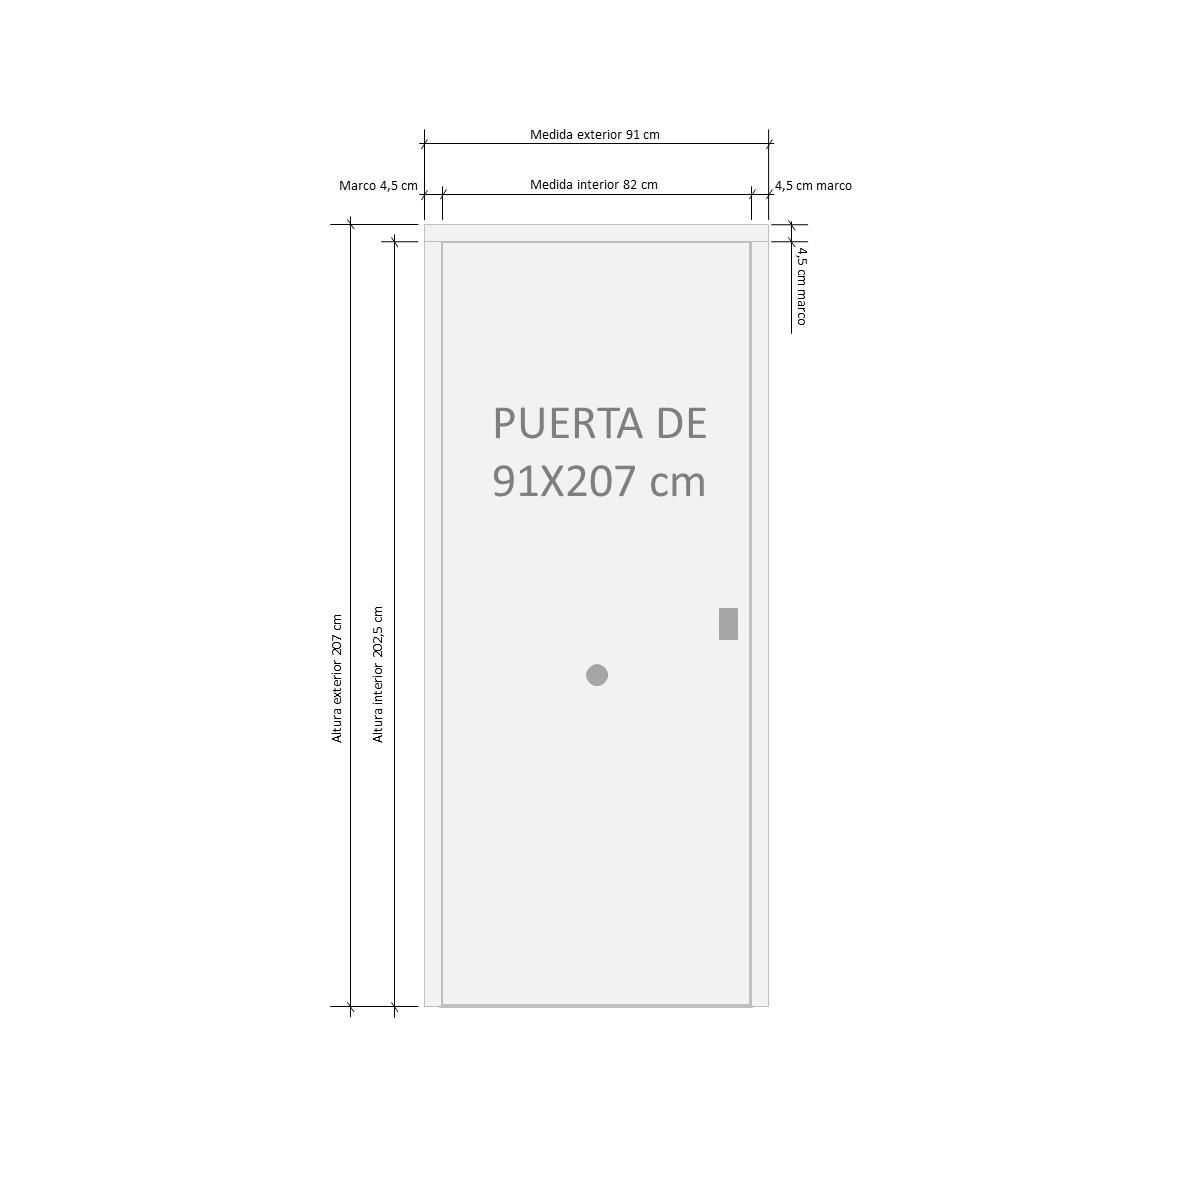 Puerta acorazada Doble Casetón Puertas acorazadas Serie B4-BL Cearco